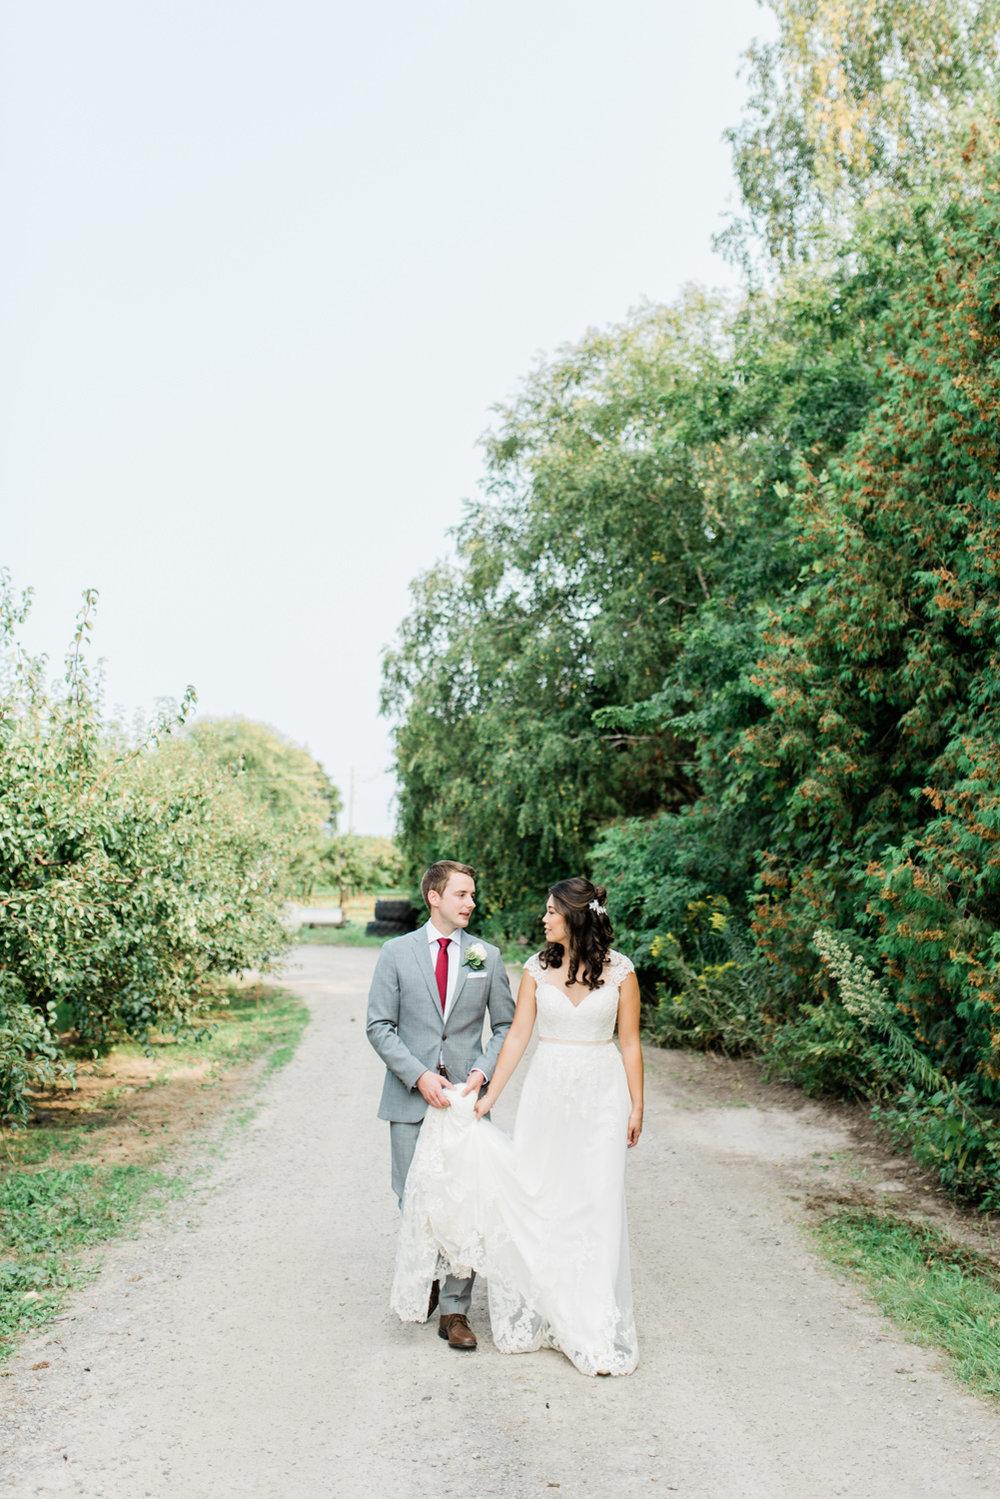 Honsberger Estate Wedding, Niagara Wedding Photographer